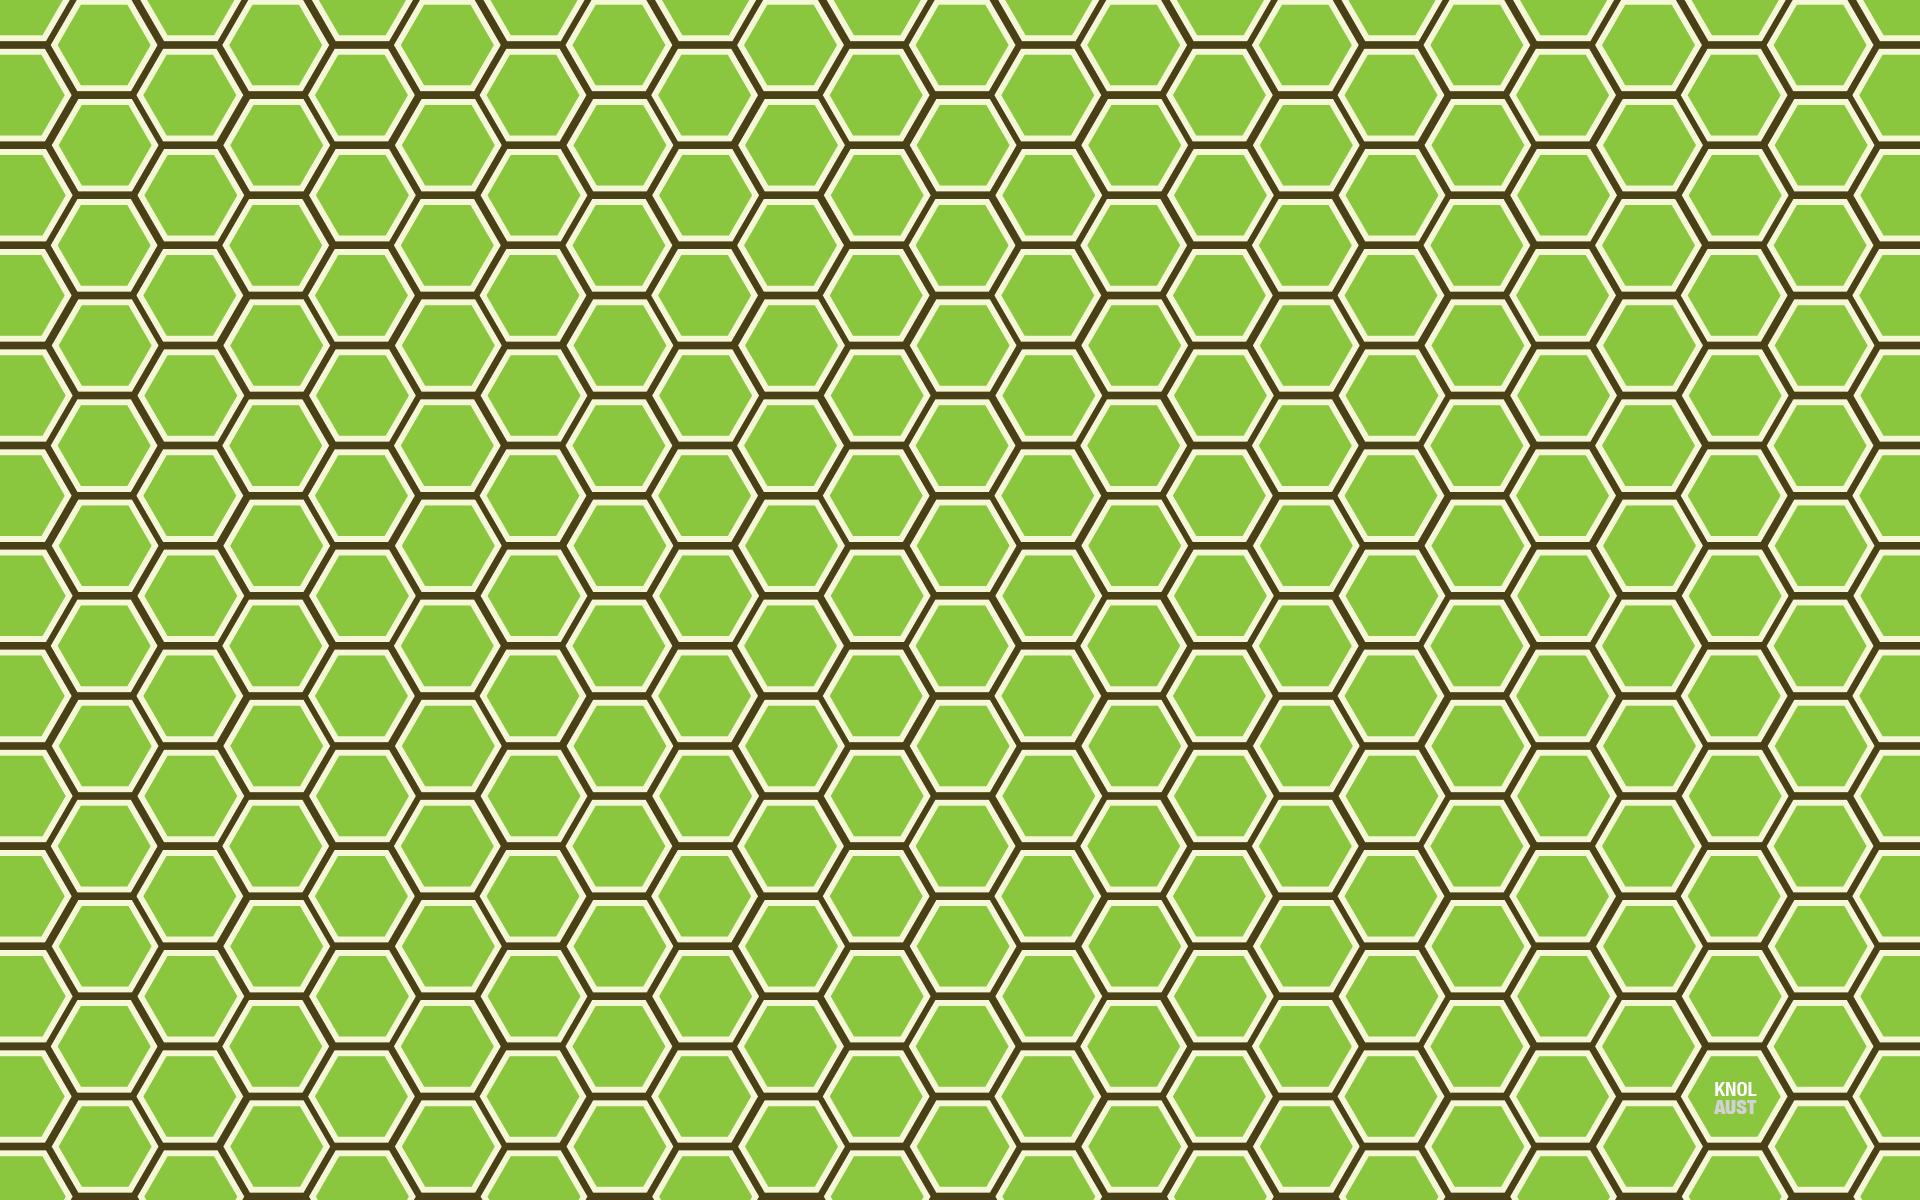 Wallpaper patterns paintable geometric grannies   888829 1920x1200